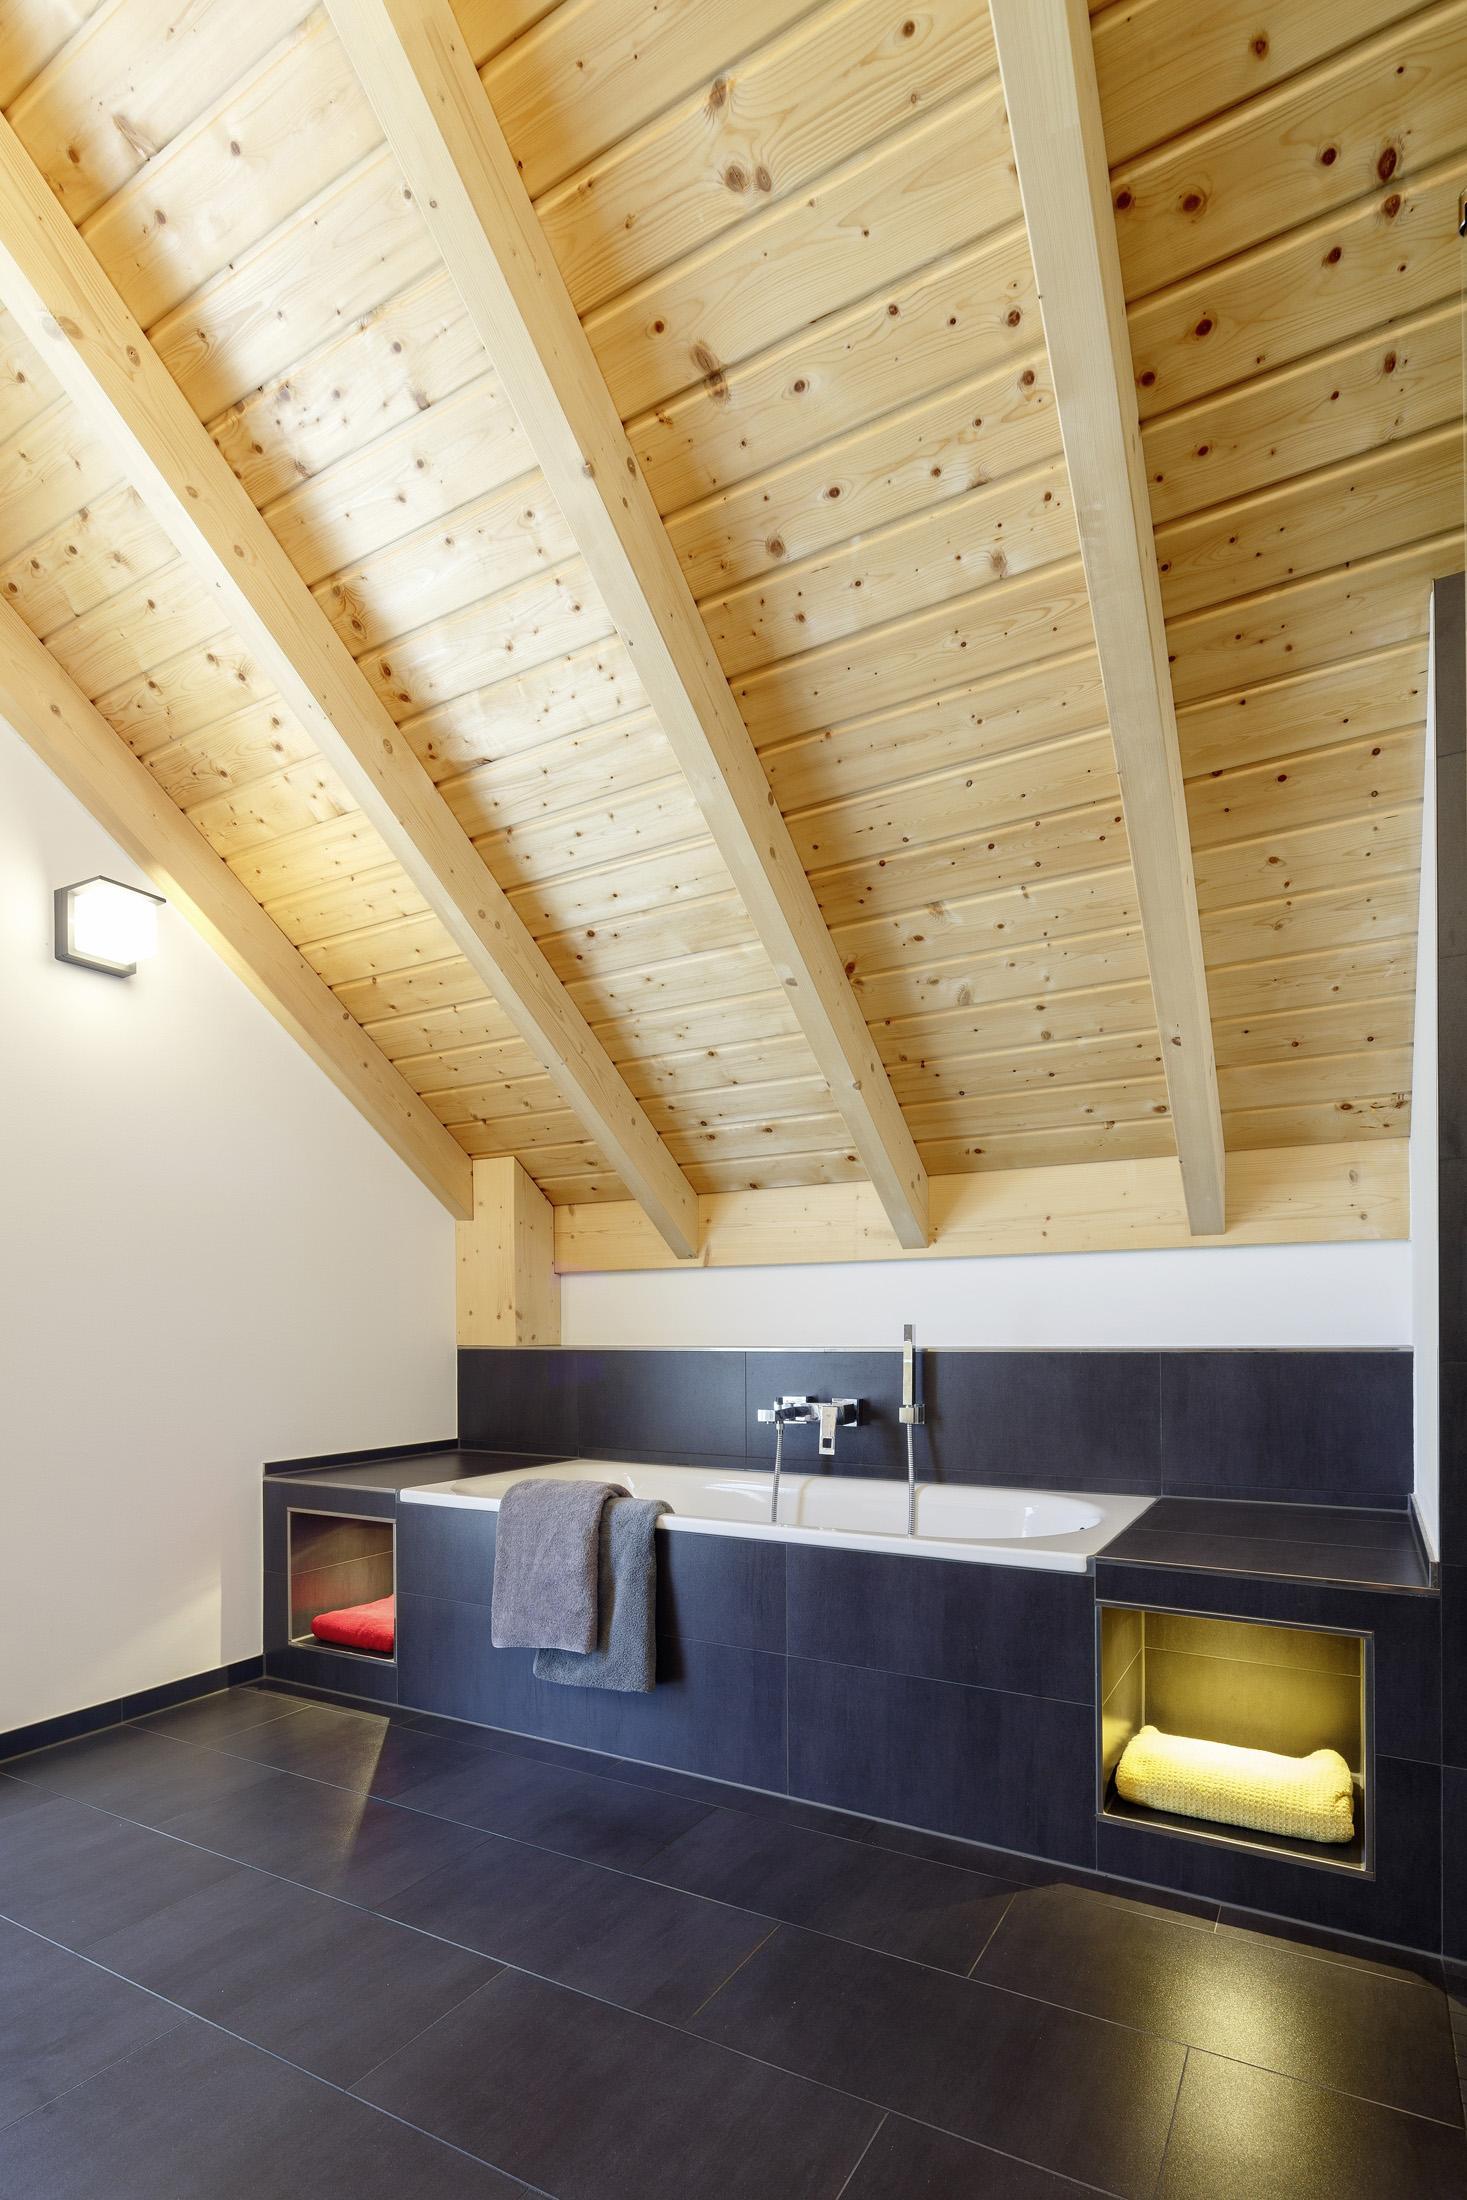 blaue fliesen bilder ideen couchstyle. Black Bedroom Furniture Sets. Home Design Ideas